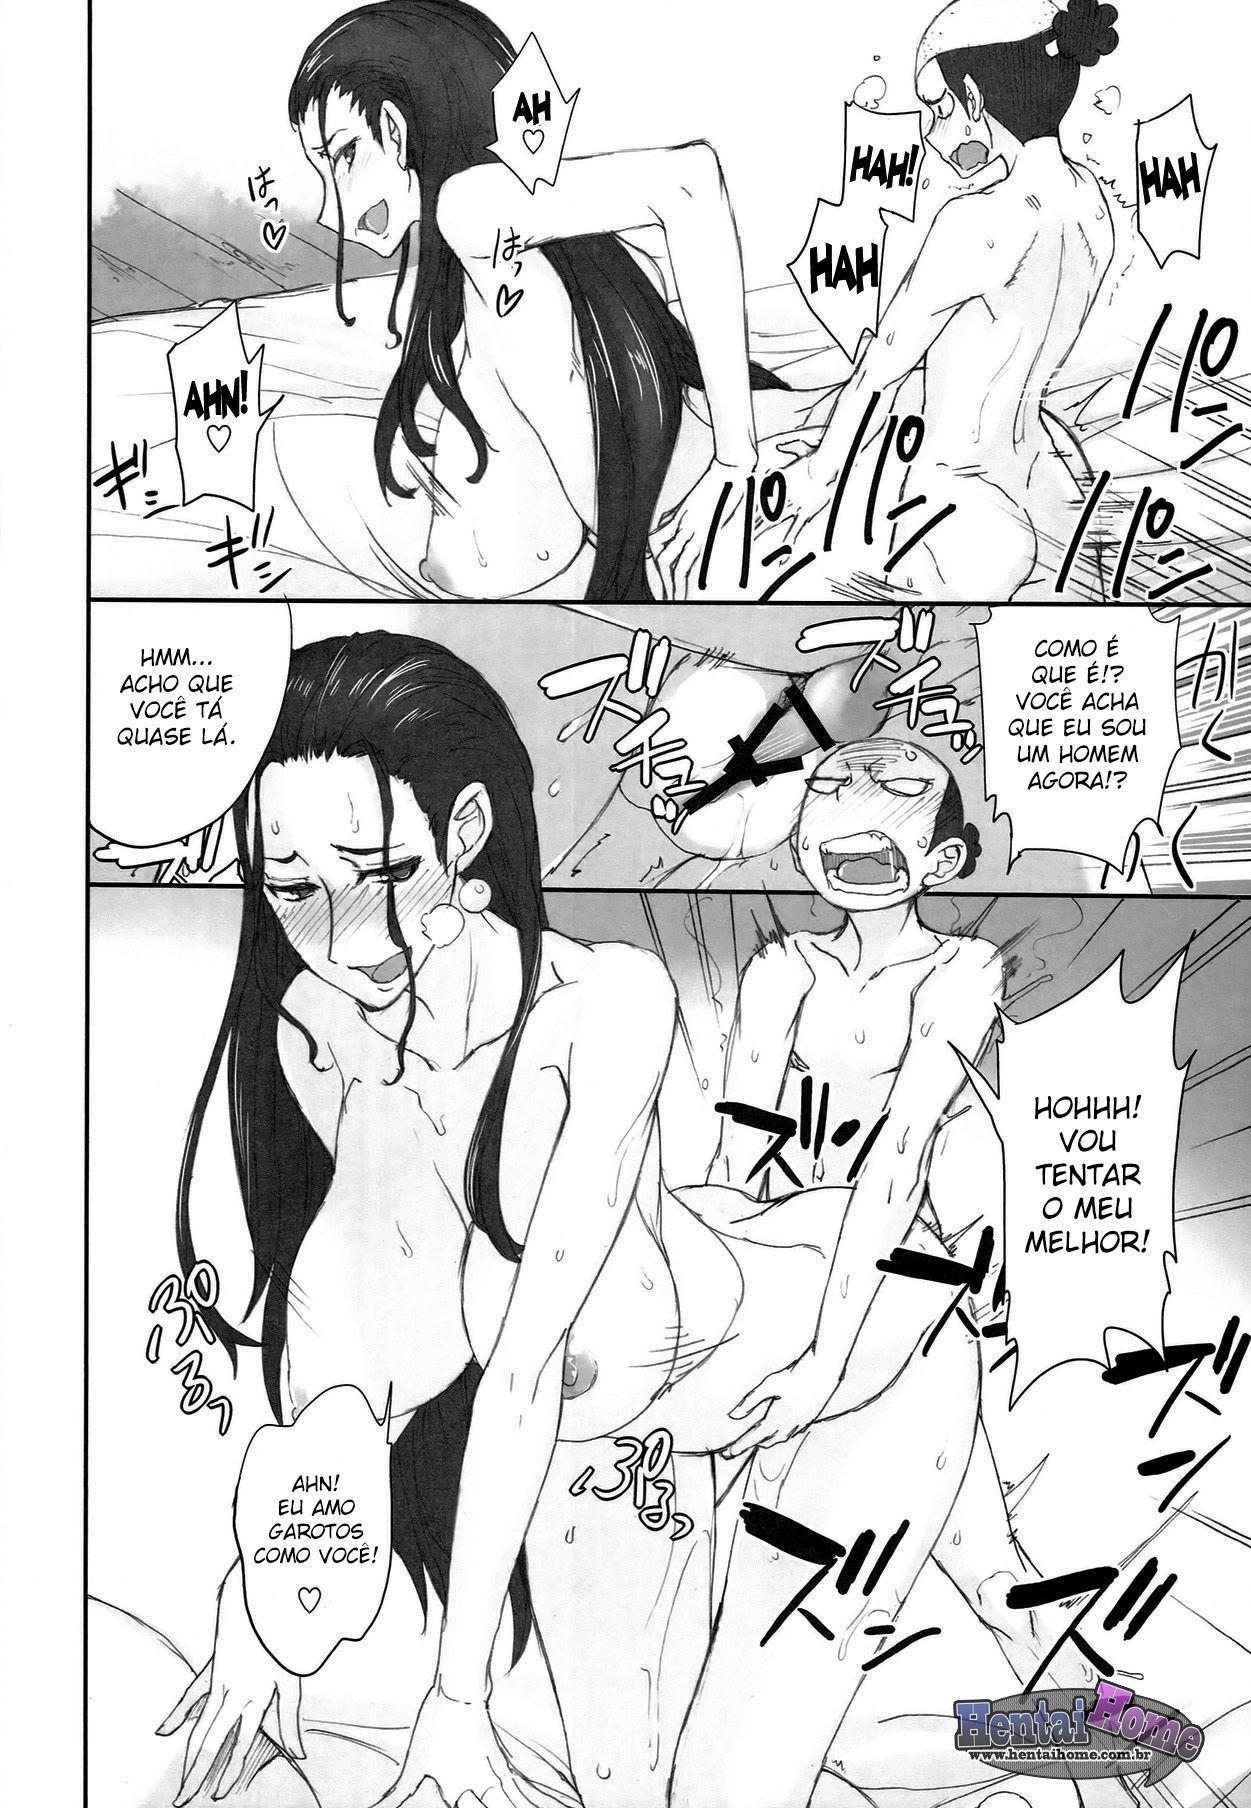 One-Piece-hentai-O-pequeno-samurai-de-Wano-18